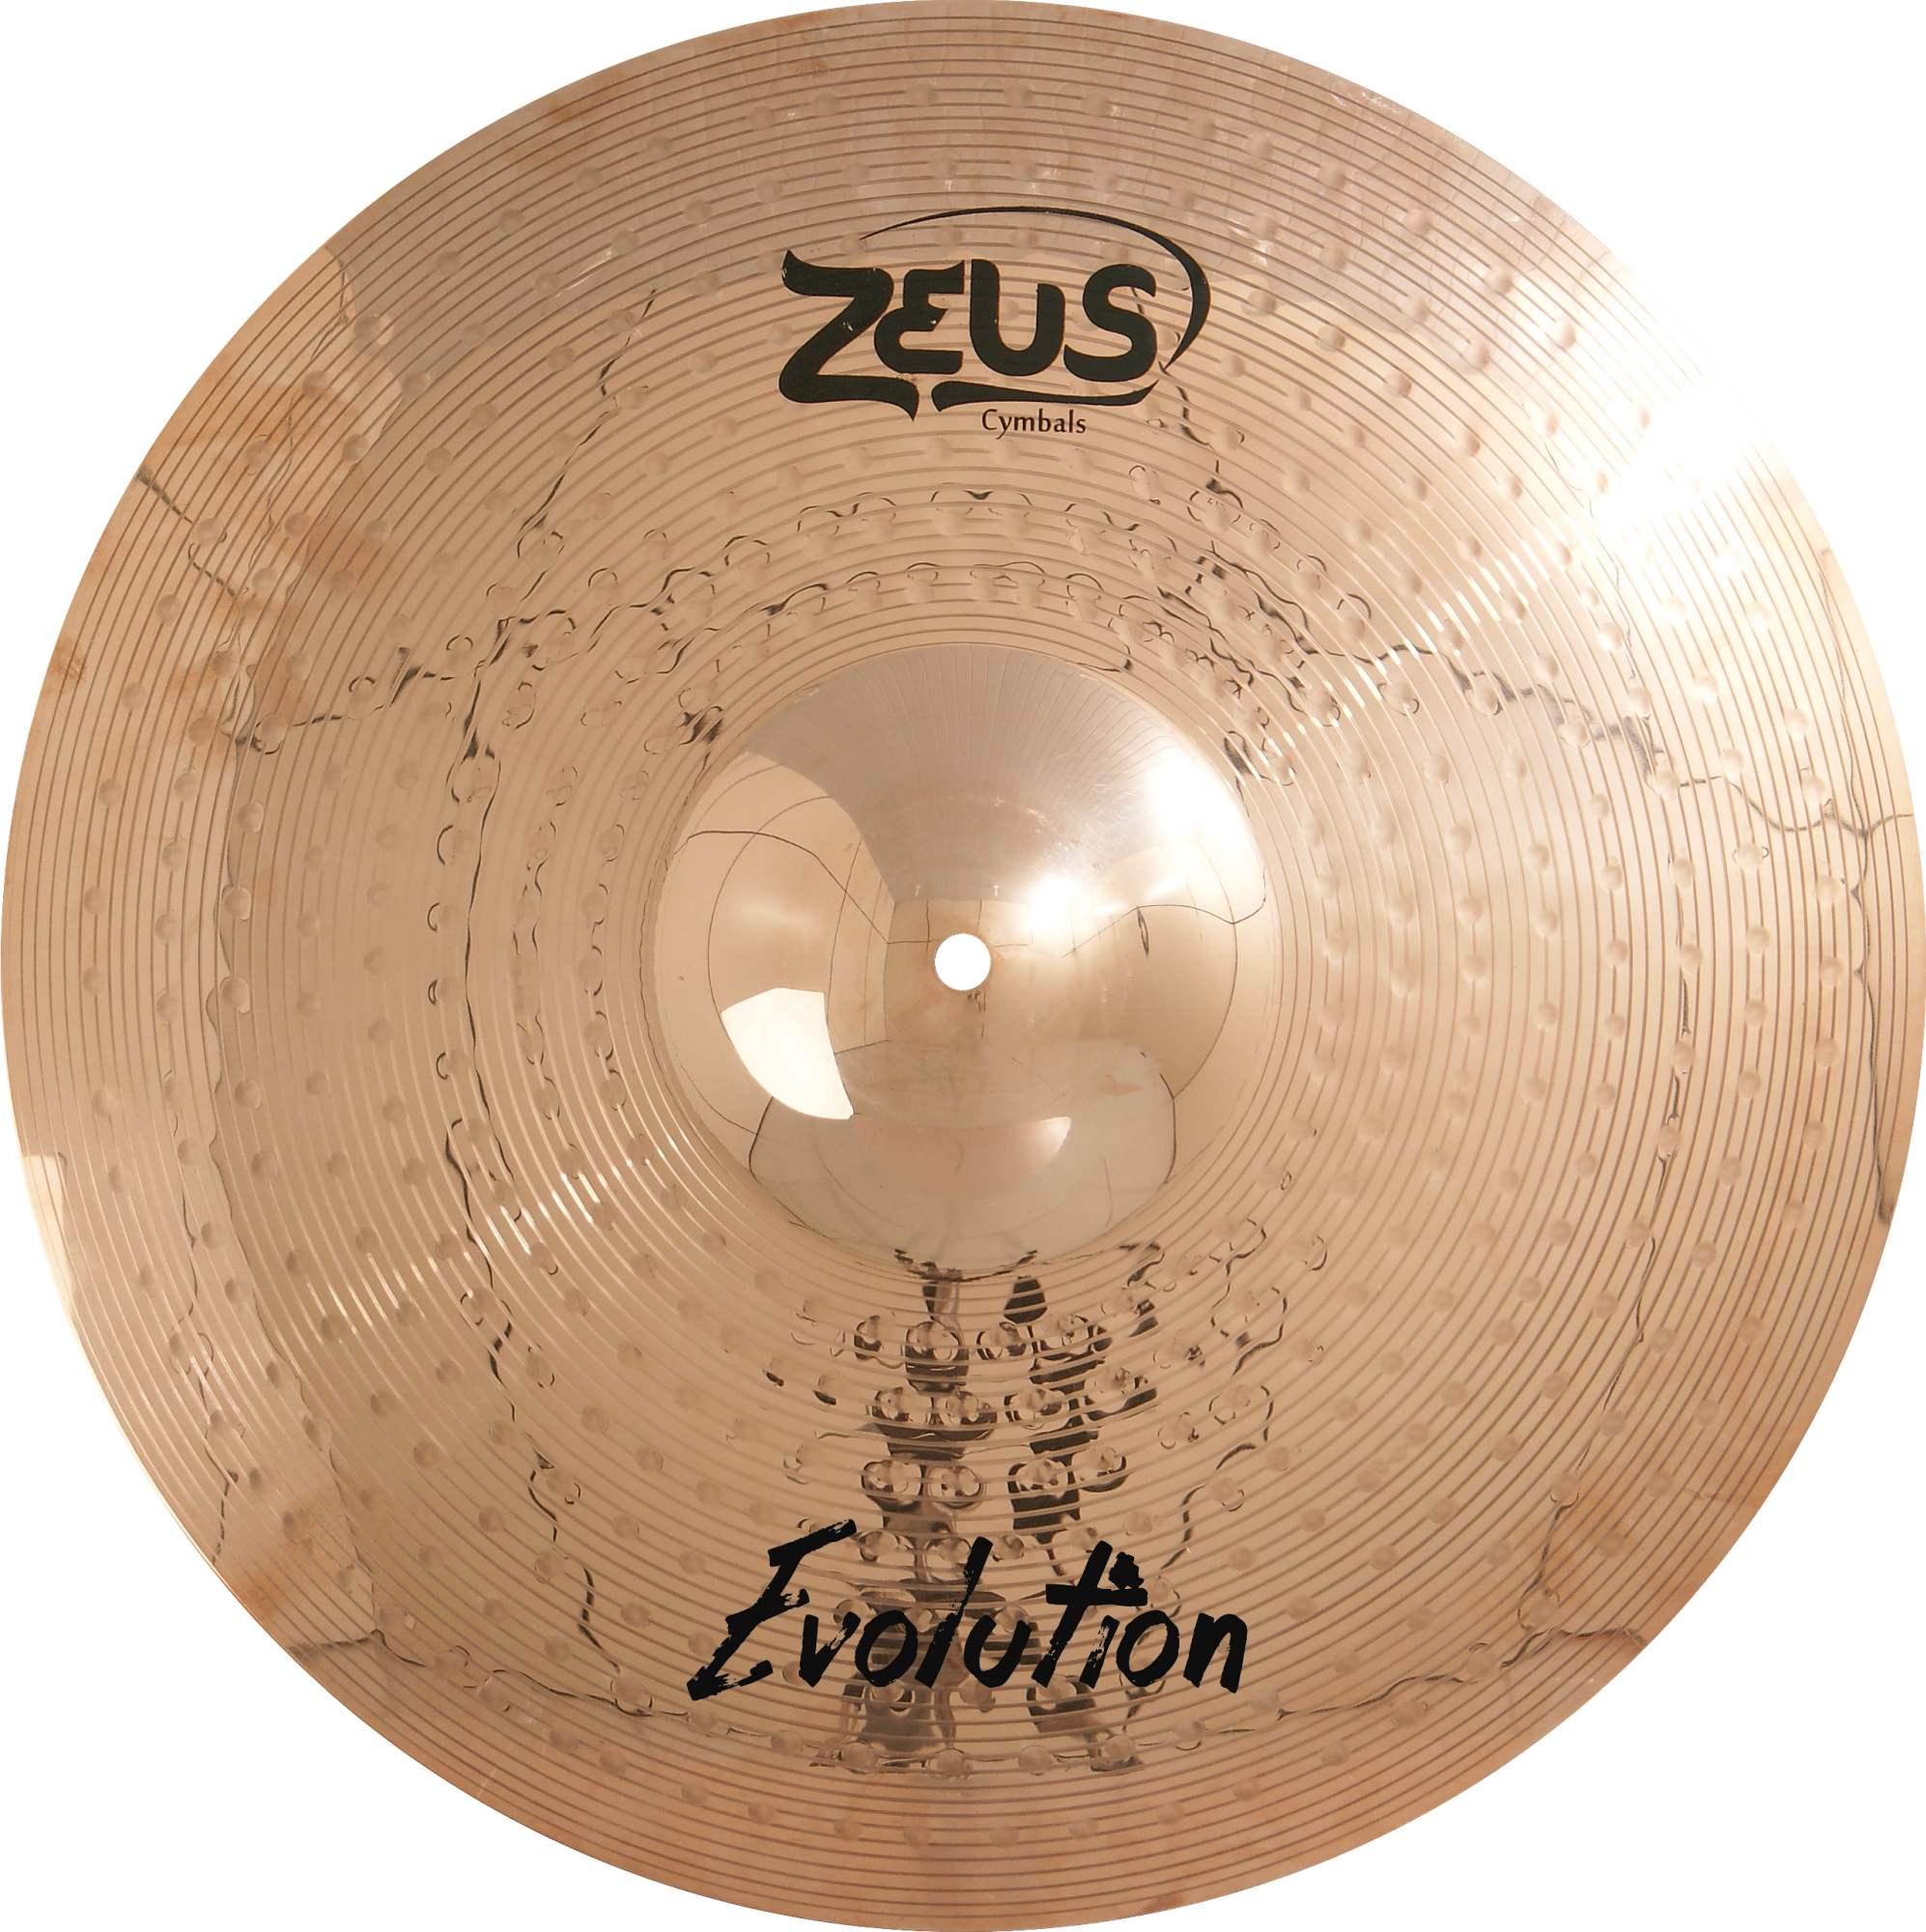 Prato Zeus Evolution Ride 20 Zev20